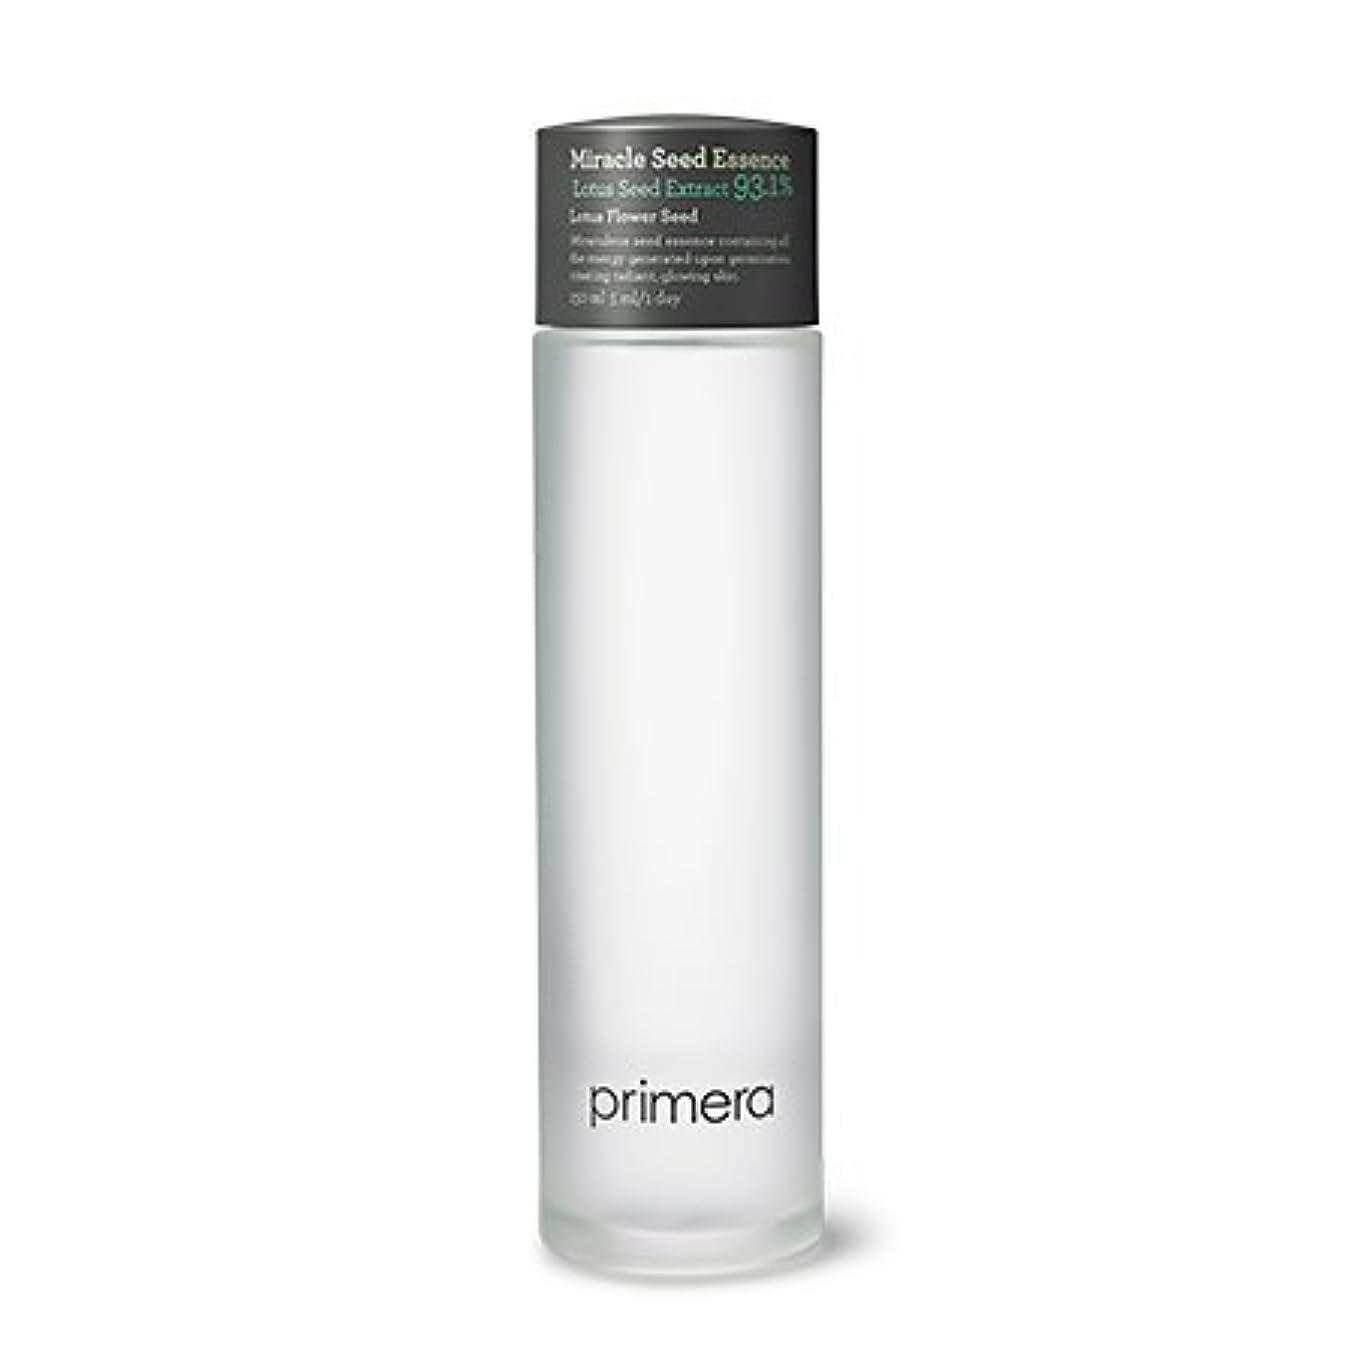 印象的年花火【Primera】Miracle Seed Essence - 150ml (韓国直送品) (SHOPPINGINSTAGRAM)